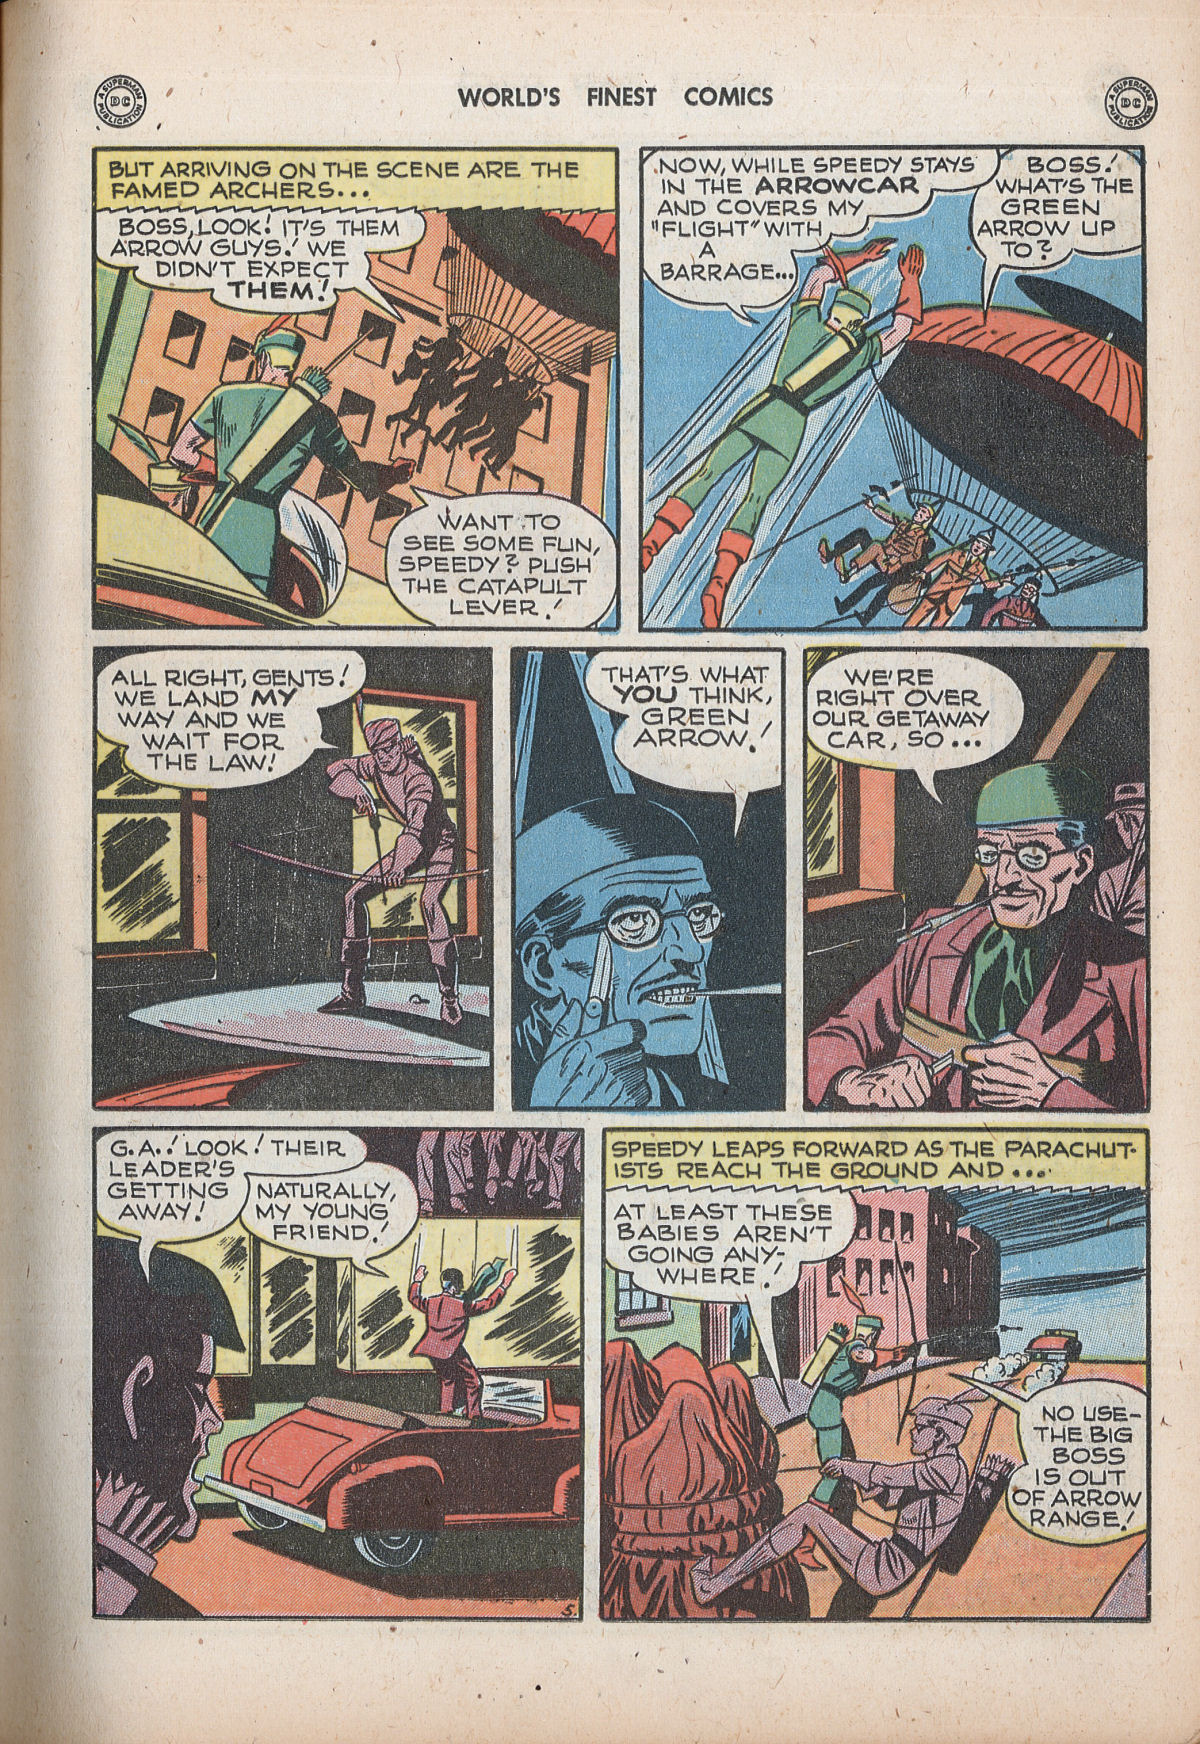 Read online World's Finest Comics comic -  Issue #32 - 21